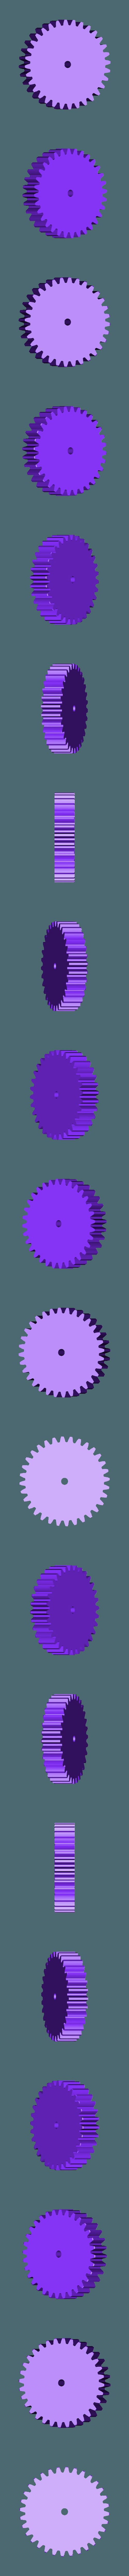 gear4.stl Download free STL file Universal GEARBOX • 3D print design, LetsPrintYT